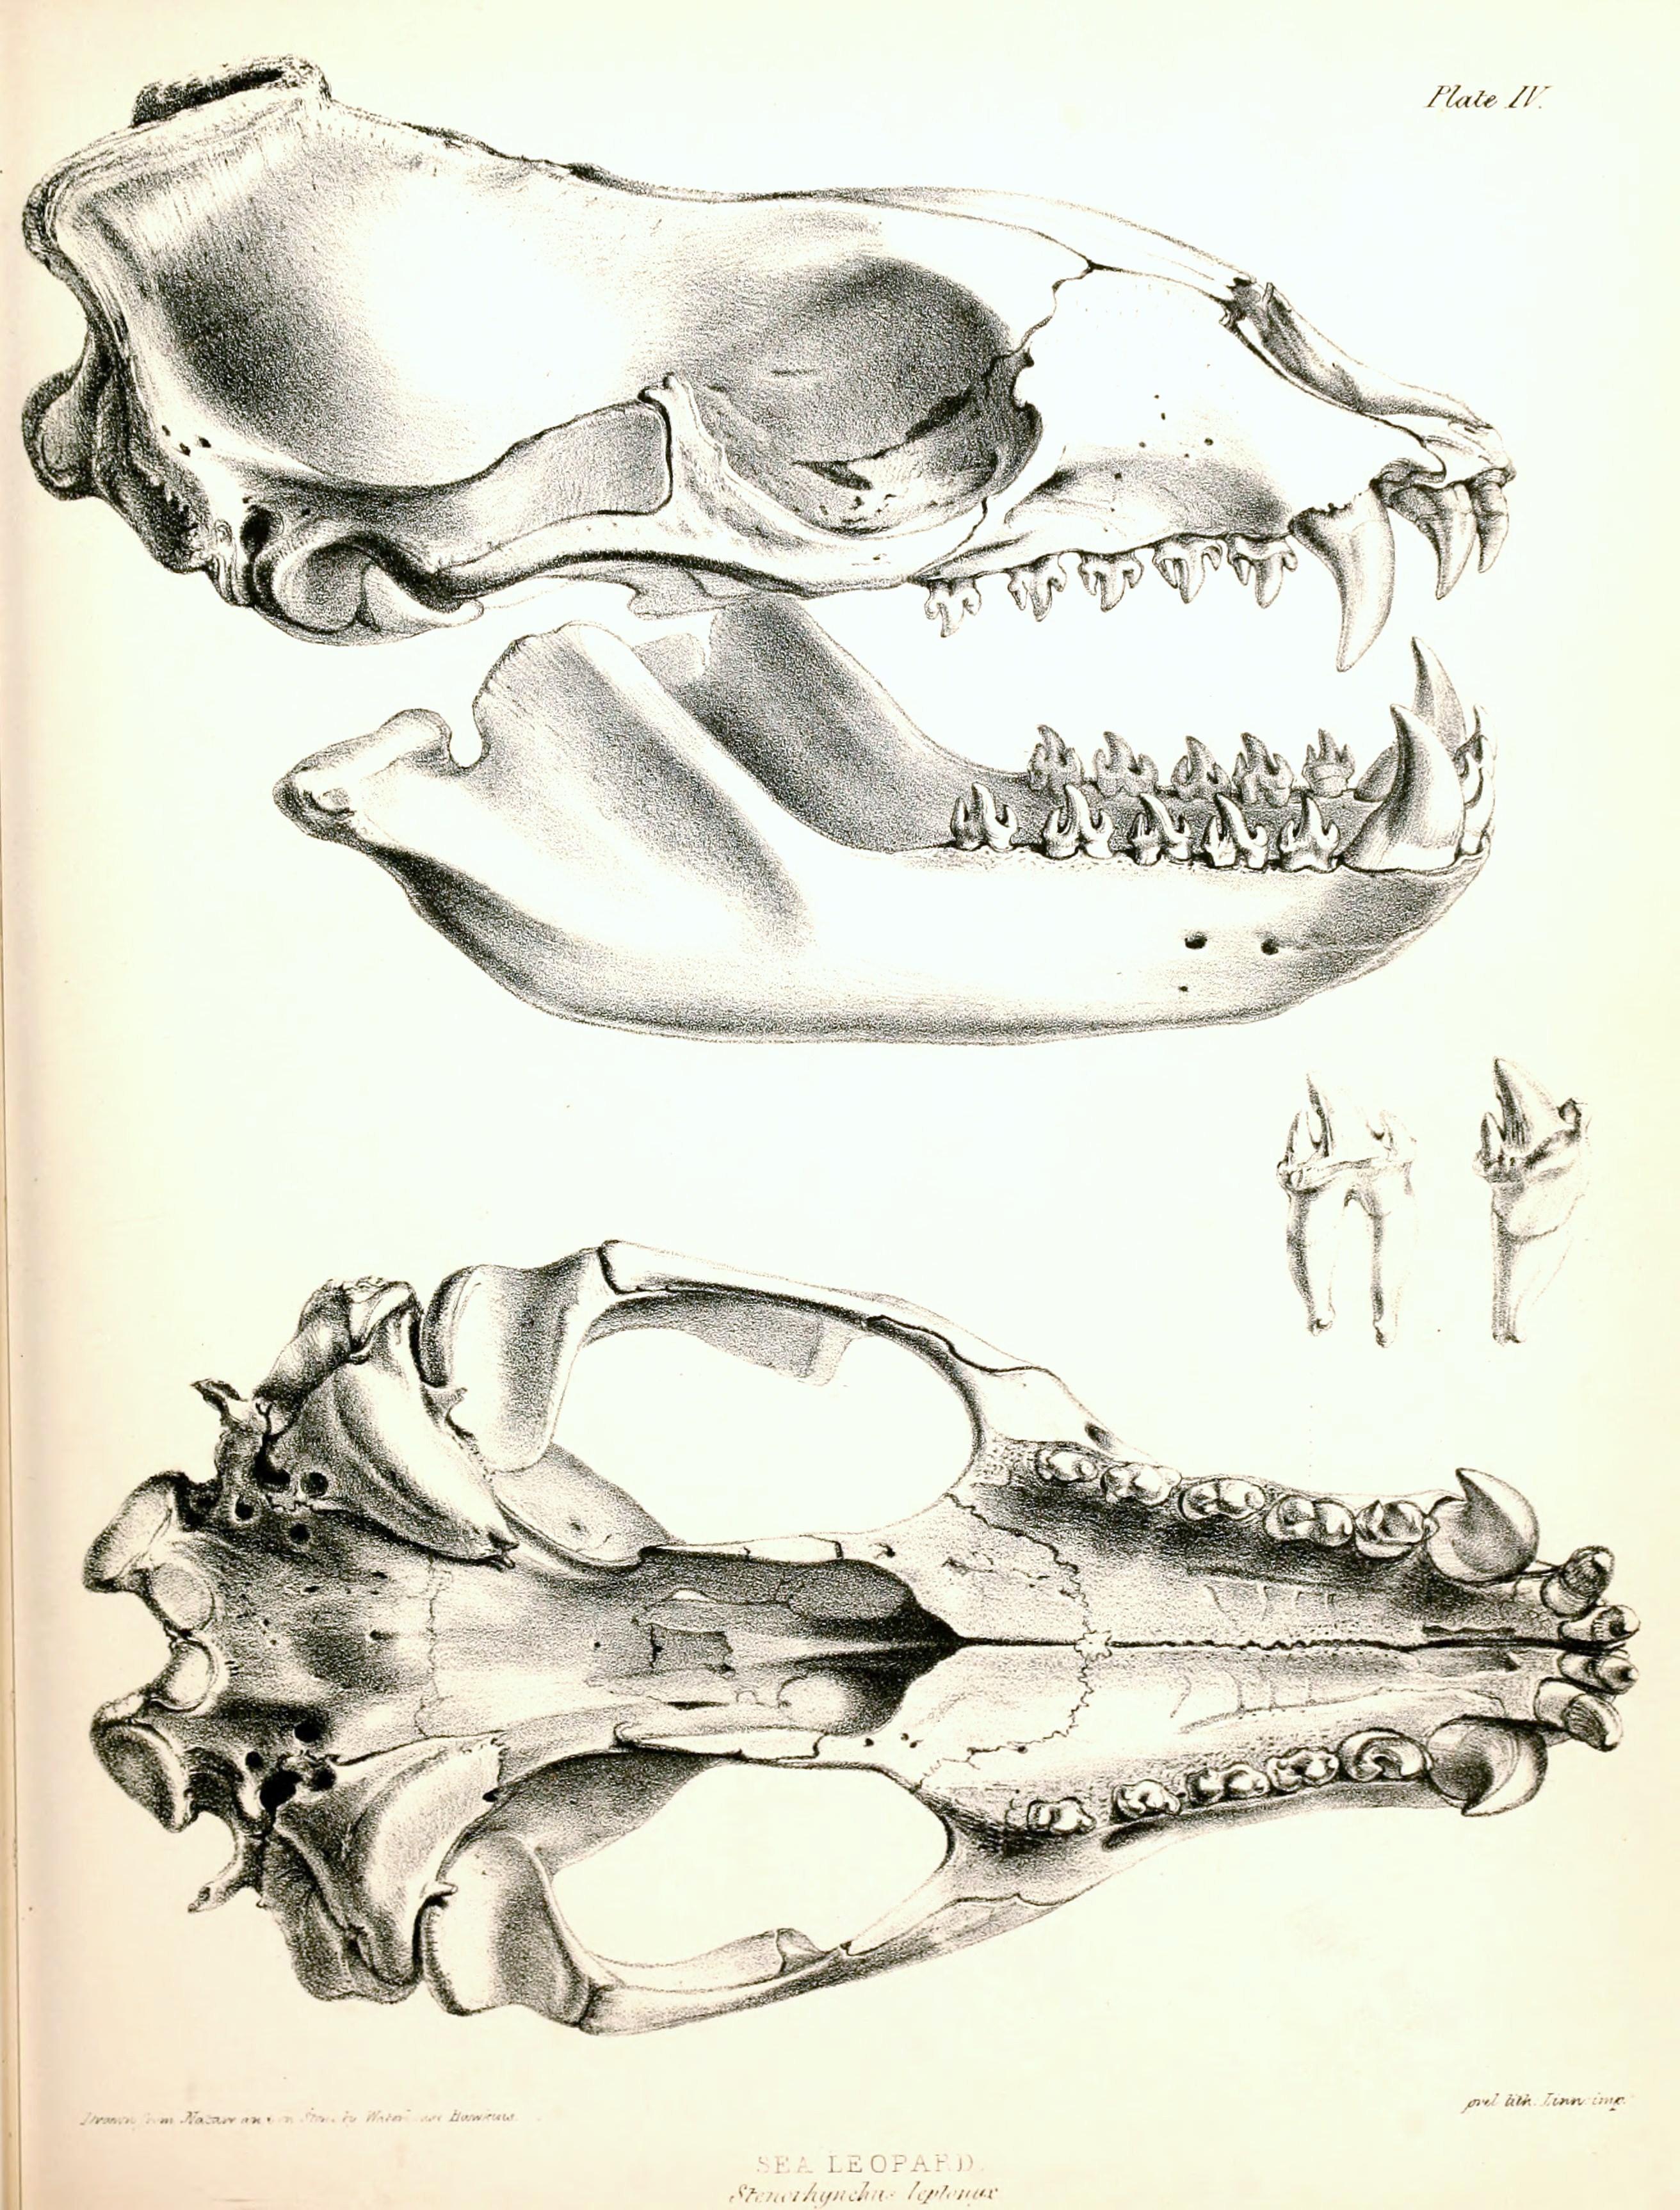 http://upload.wikimedia.org/wikipedia/commons/8/8a/Leopard_Seal_skull_1844.jpg